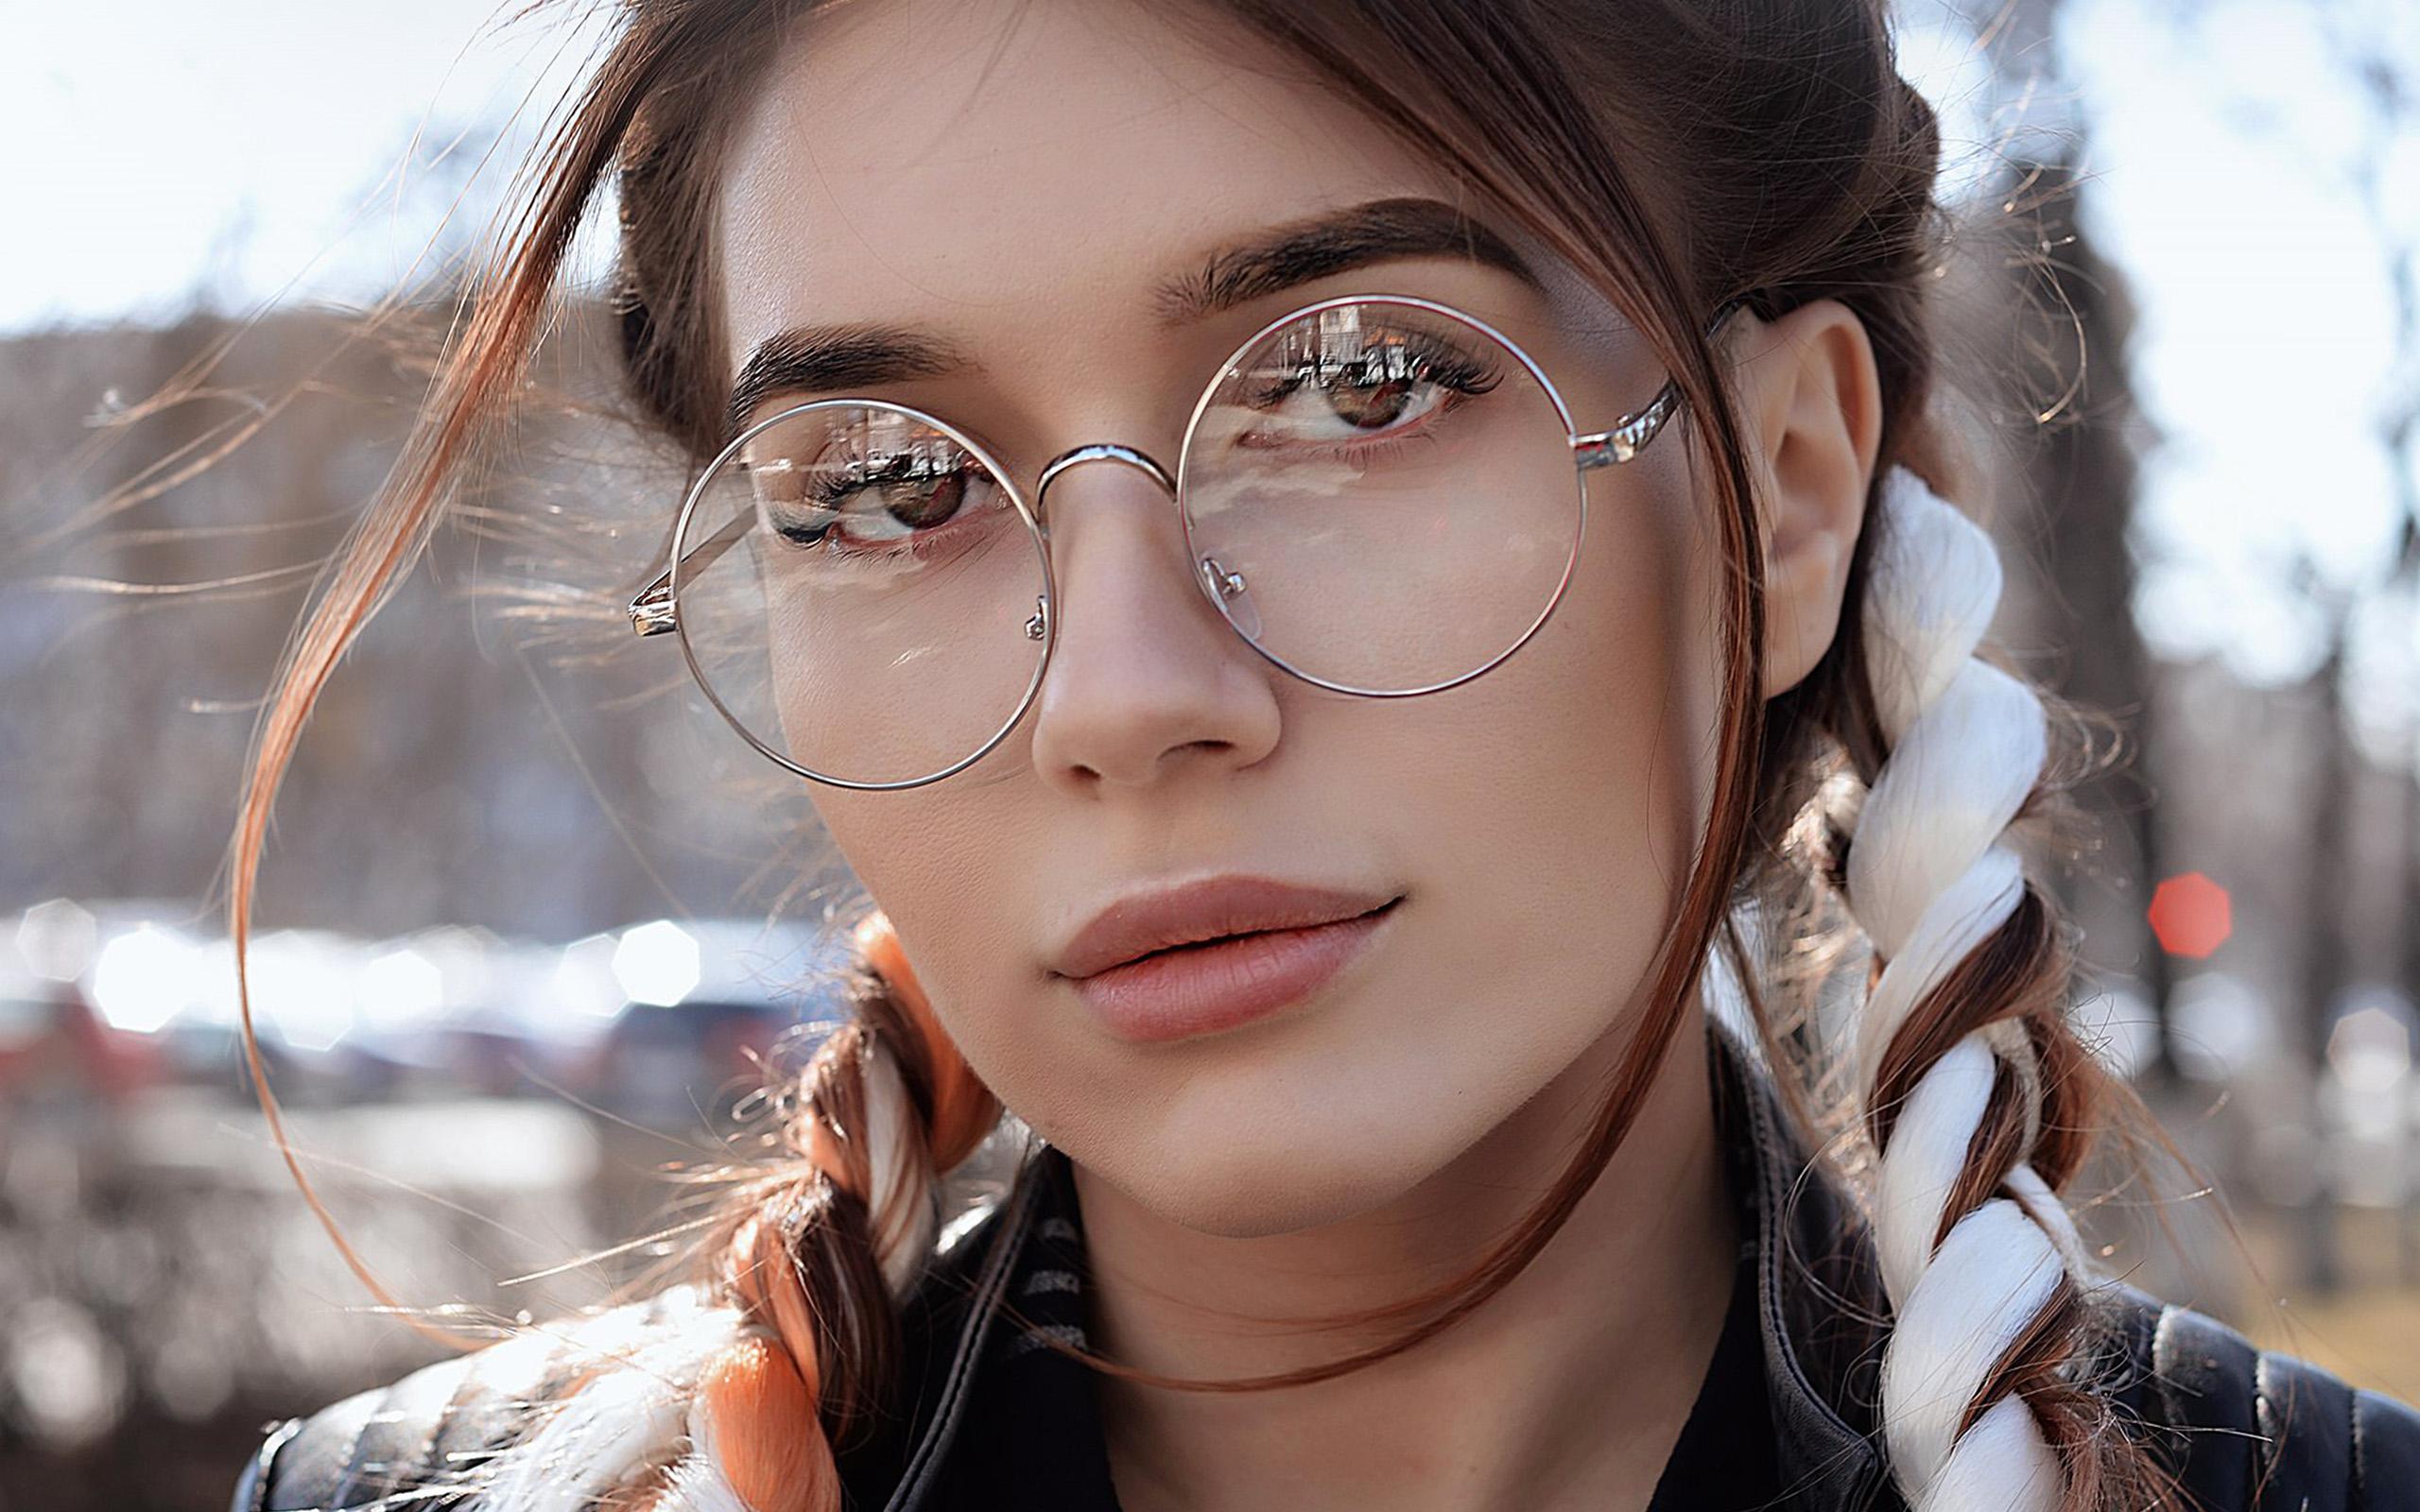 Cute Small Girl Wallpaper Hp49 Dua Lipa Girl Glasses Wallpaper